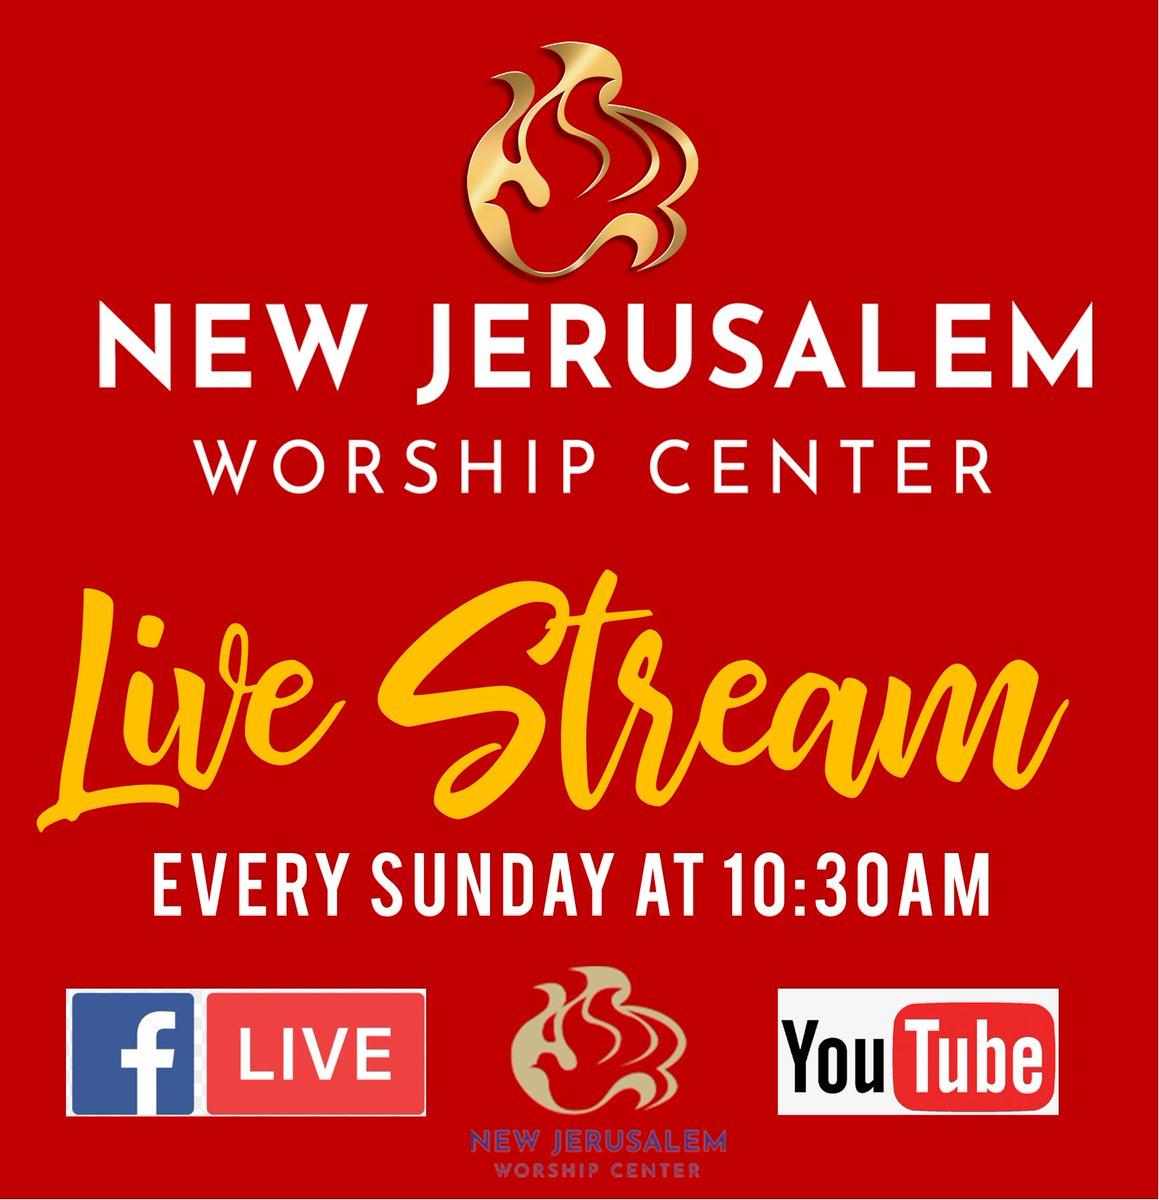 New Jerusalem Worship Center